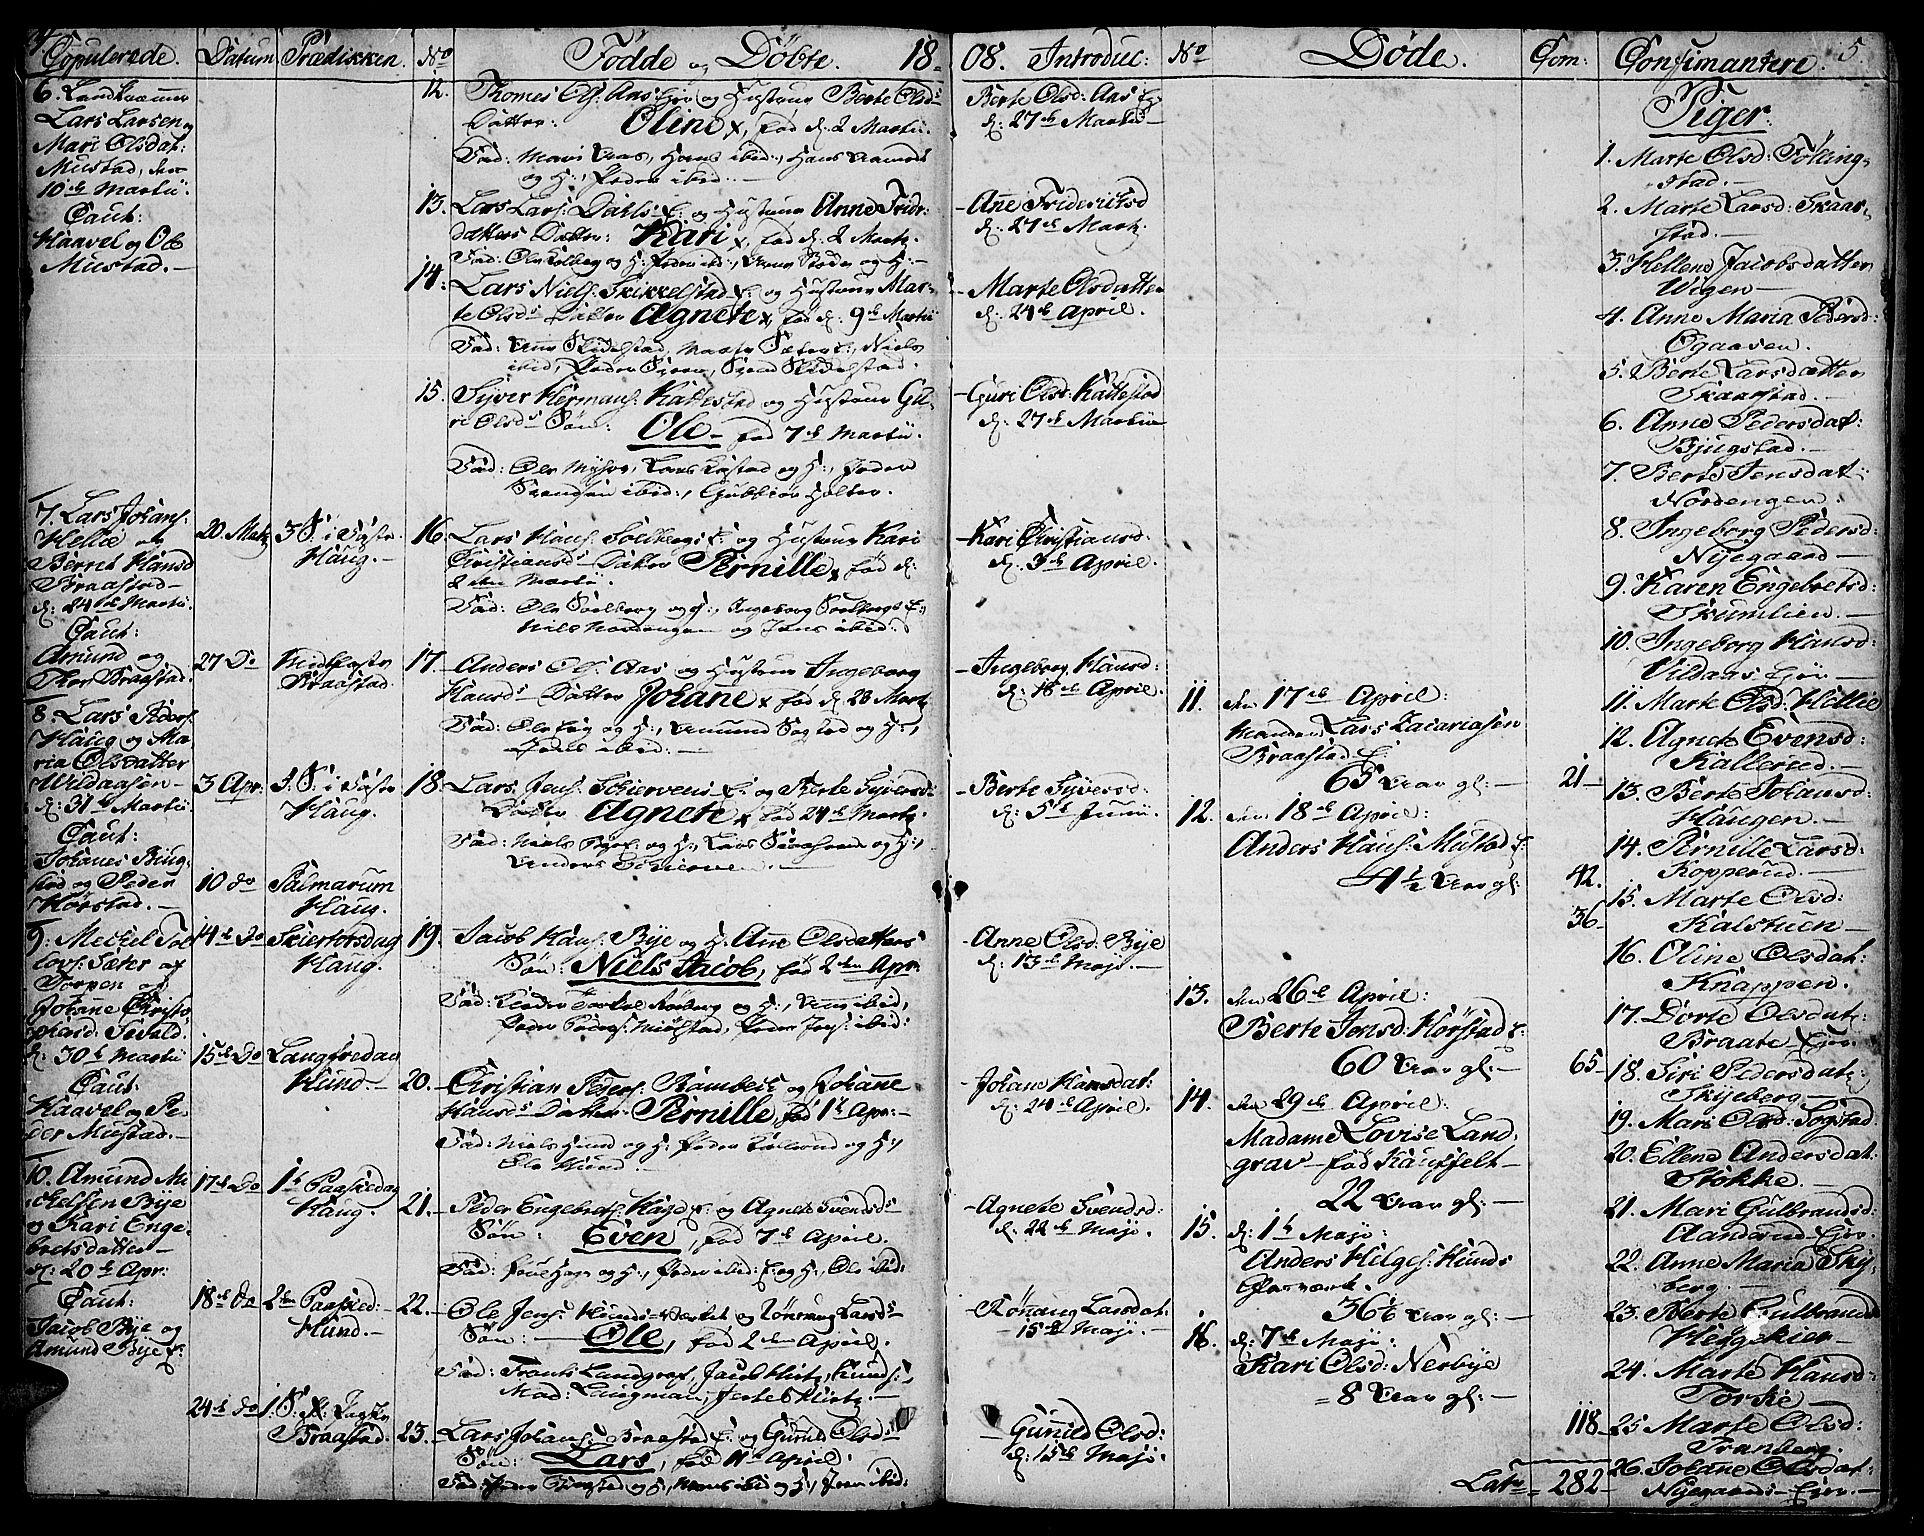 SAH, Vardal prestekontor, H/Ha/Haa/L0003: Ministerialbok nr. 3, 1808-1814, s. 4-5